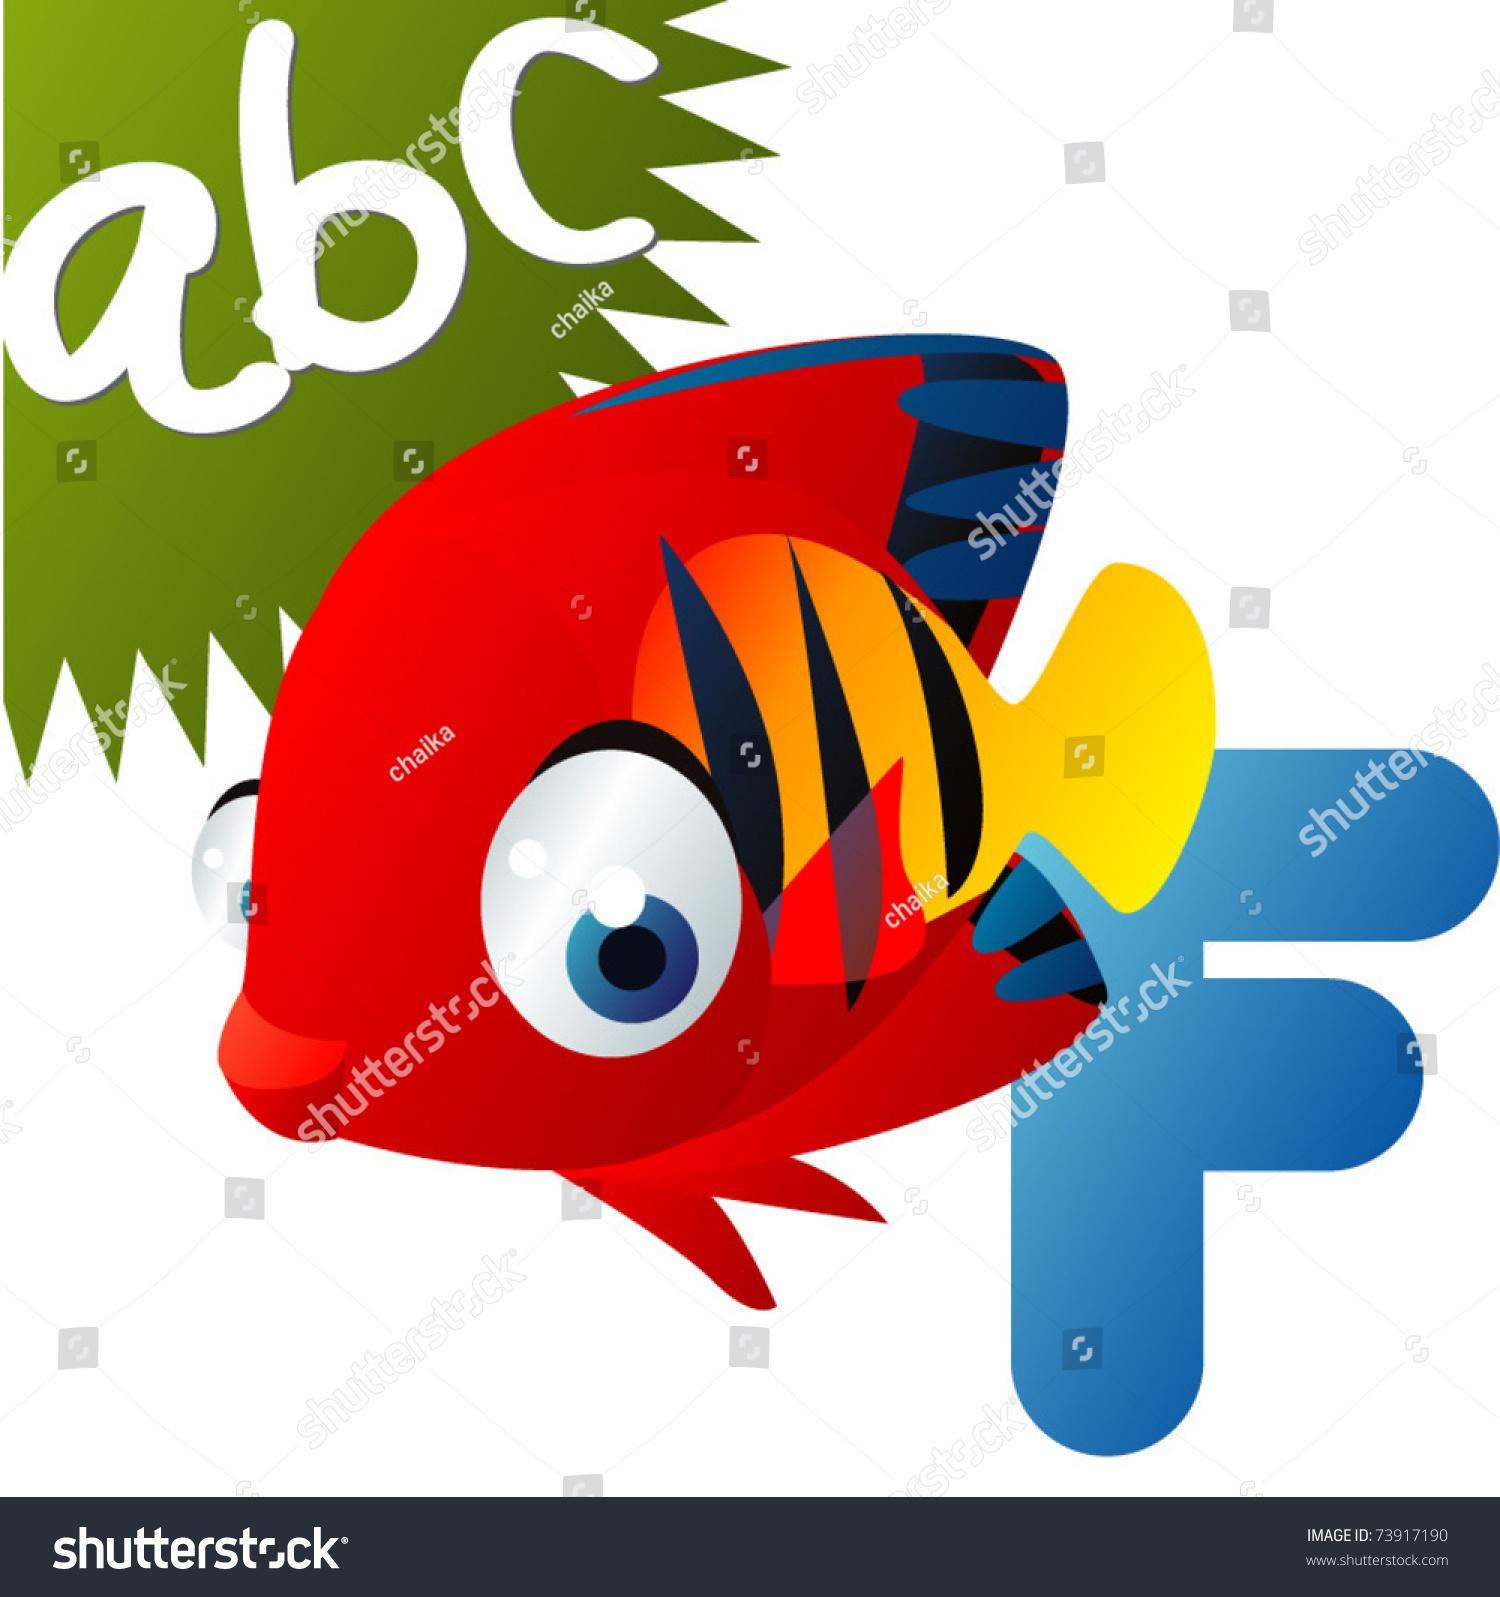 animal alphabet f fish stock vector 73917190 shutterstock